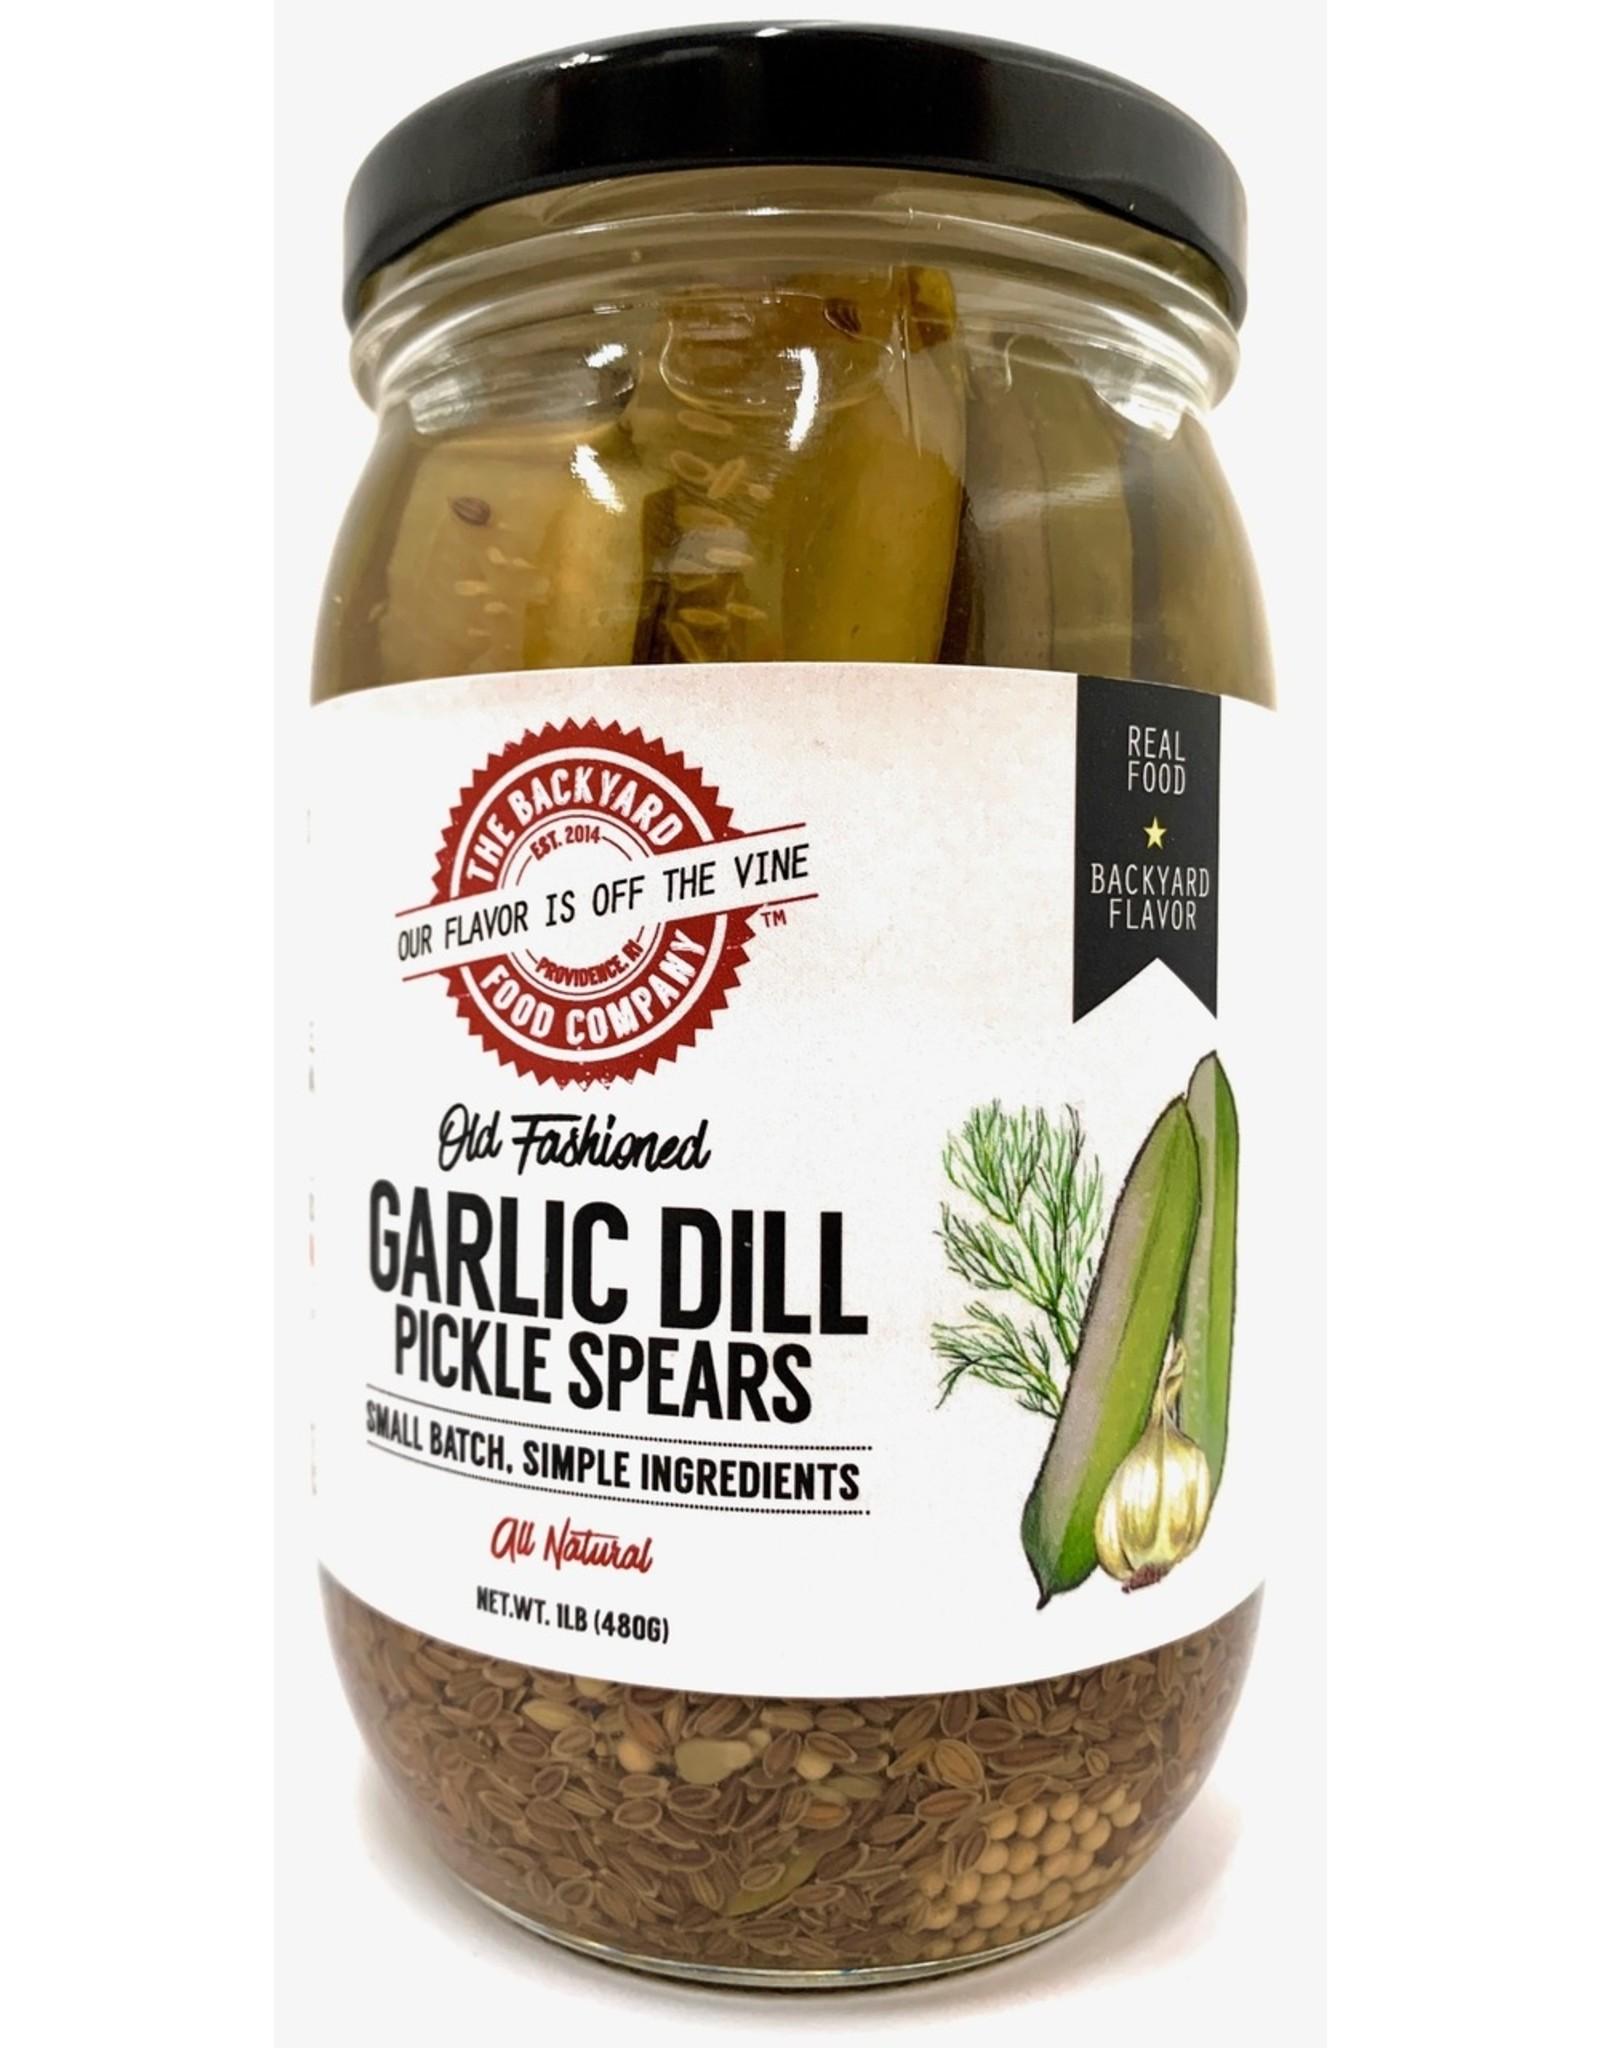 Backyard Food Co. RI Backyard Food Co. Garlic Dill Spears Pickles